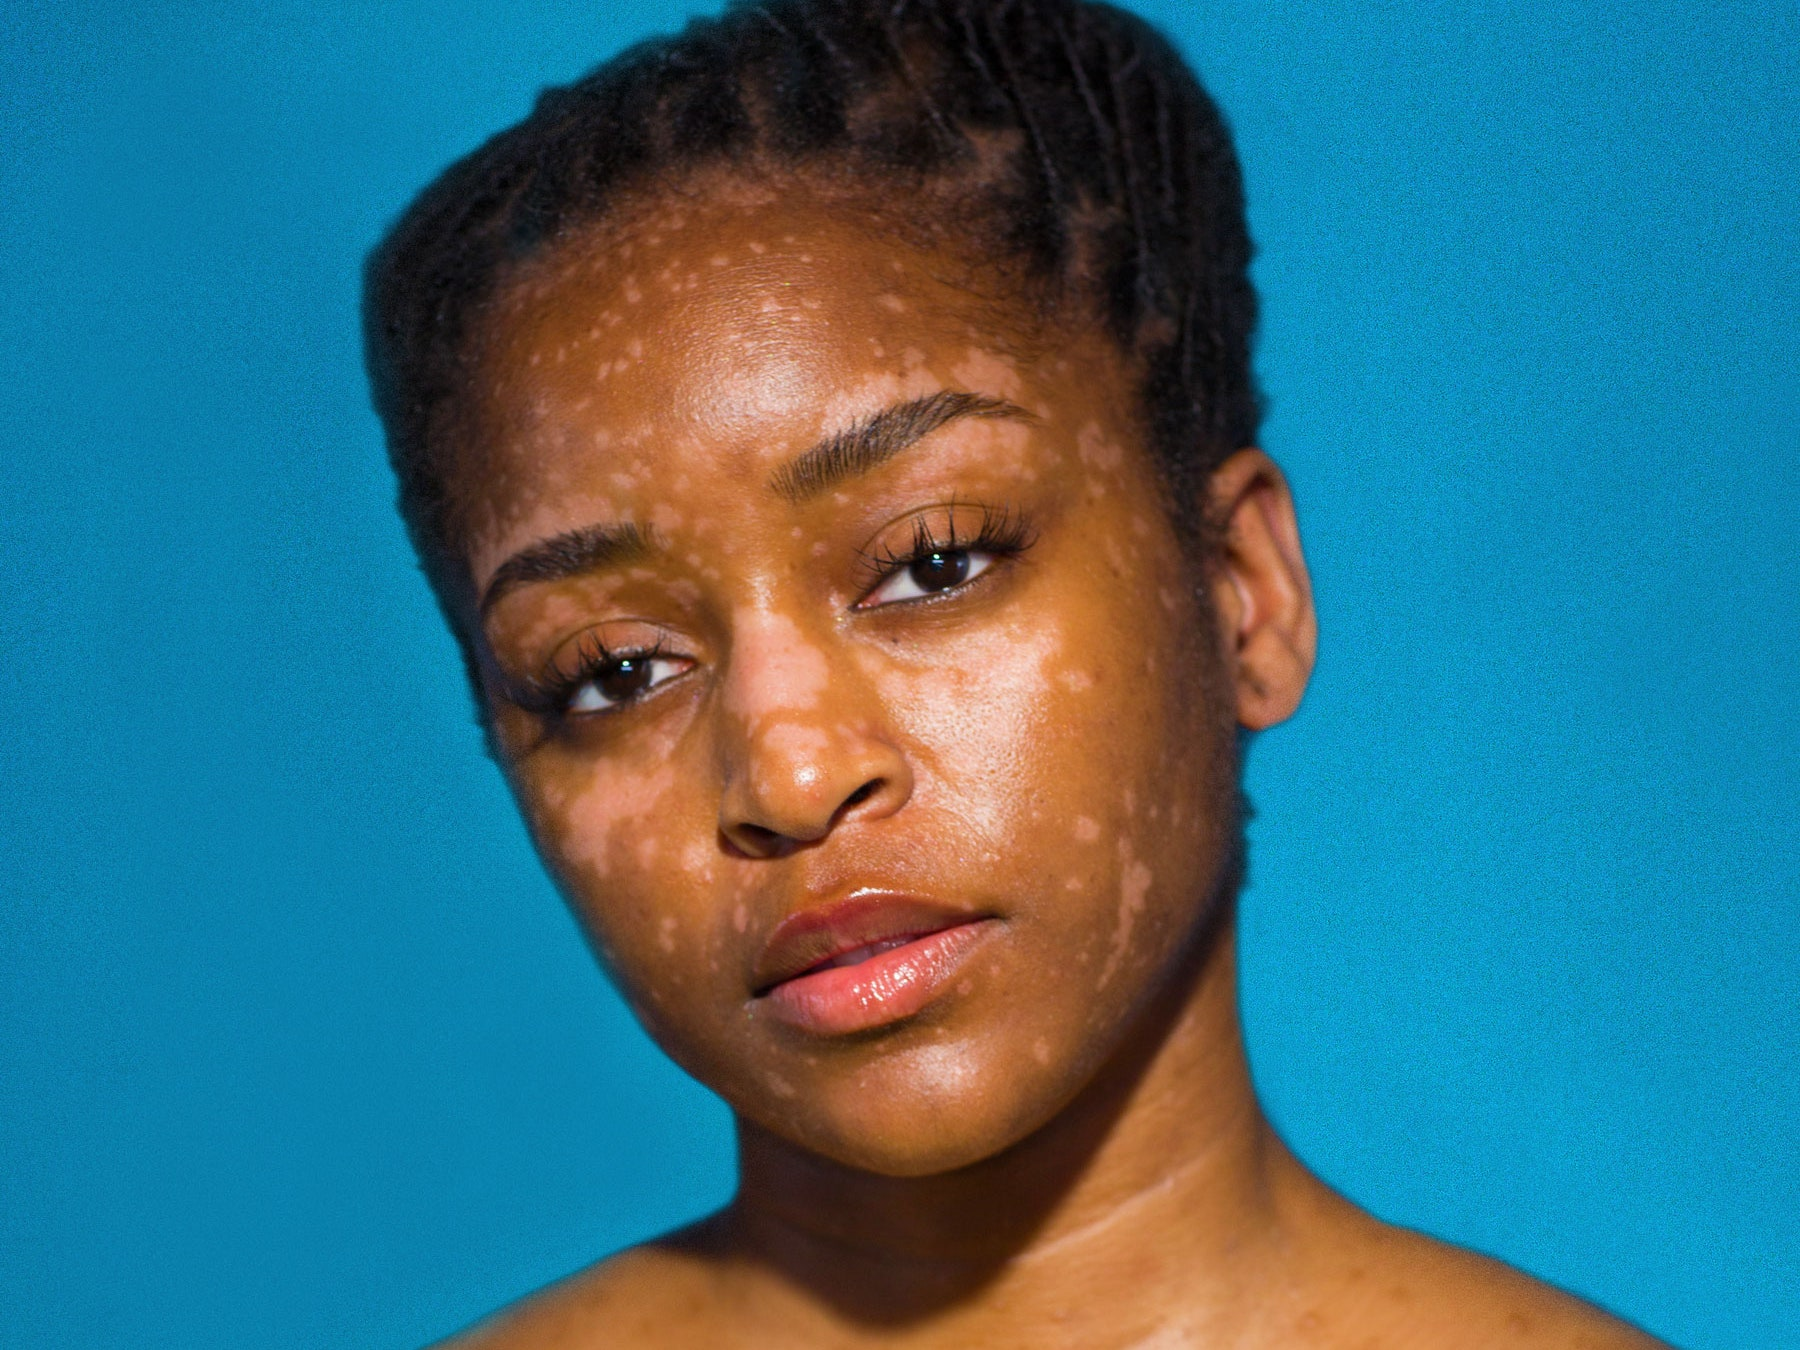 Mint fürdés a psoriasis